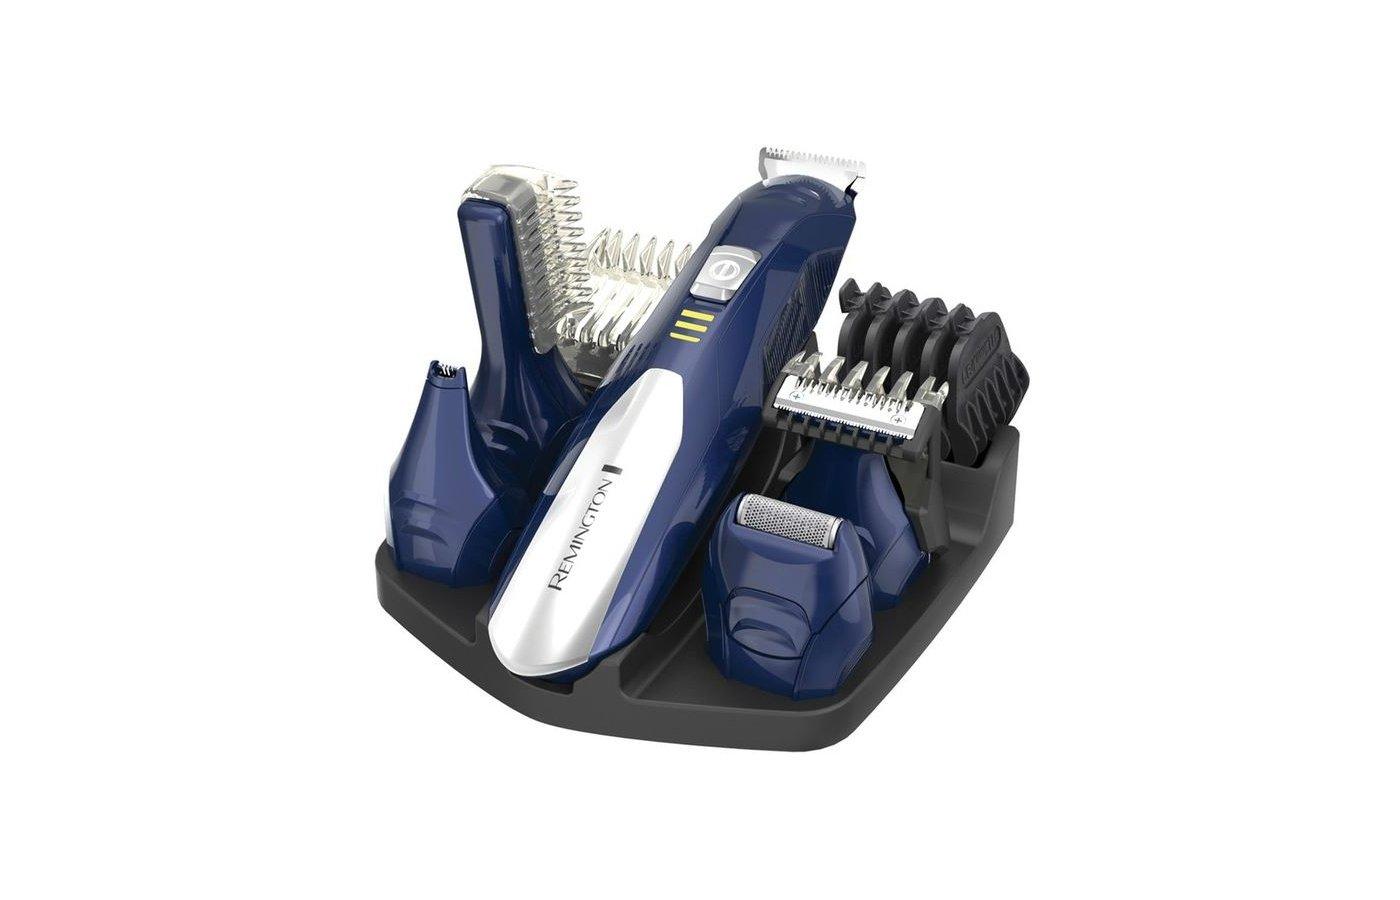 Машинка для стрижки волос REMINGTON PG 6045